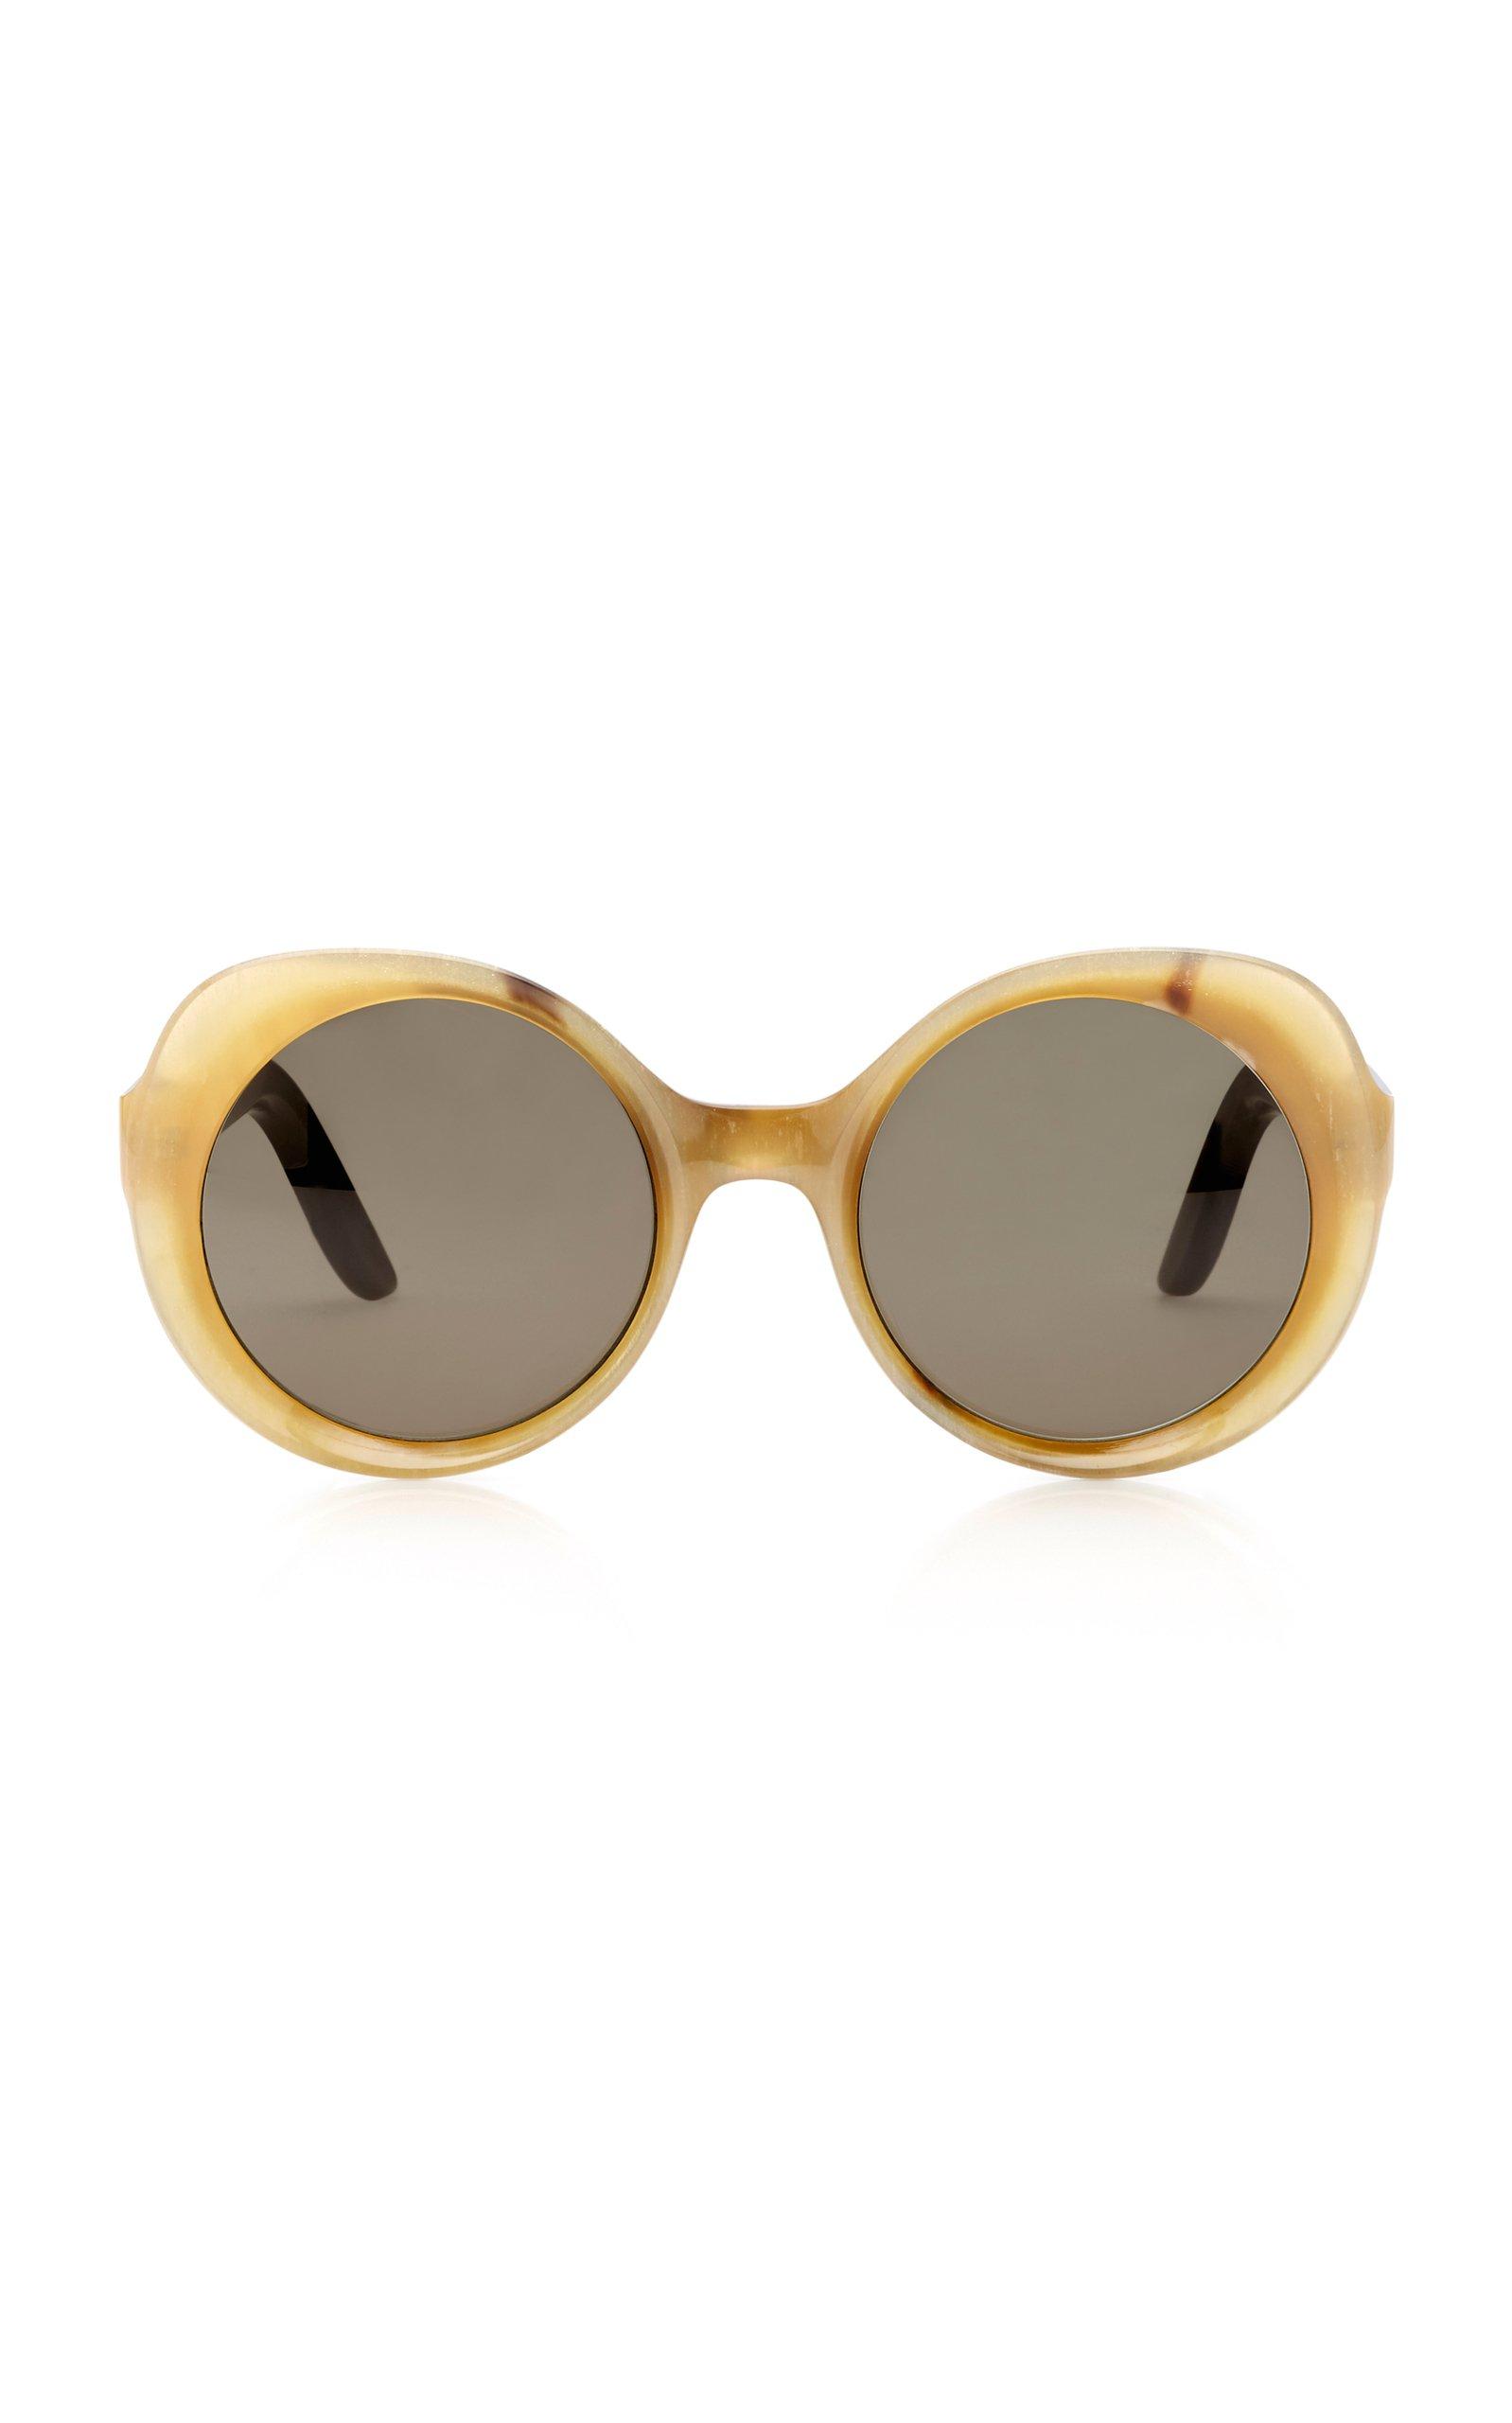 Lapima Carlota Oversized Round-Frame Horn Sunglasses